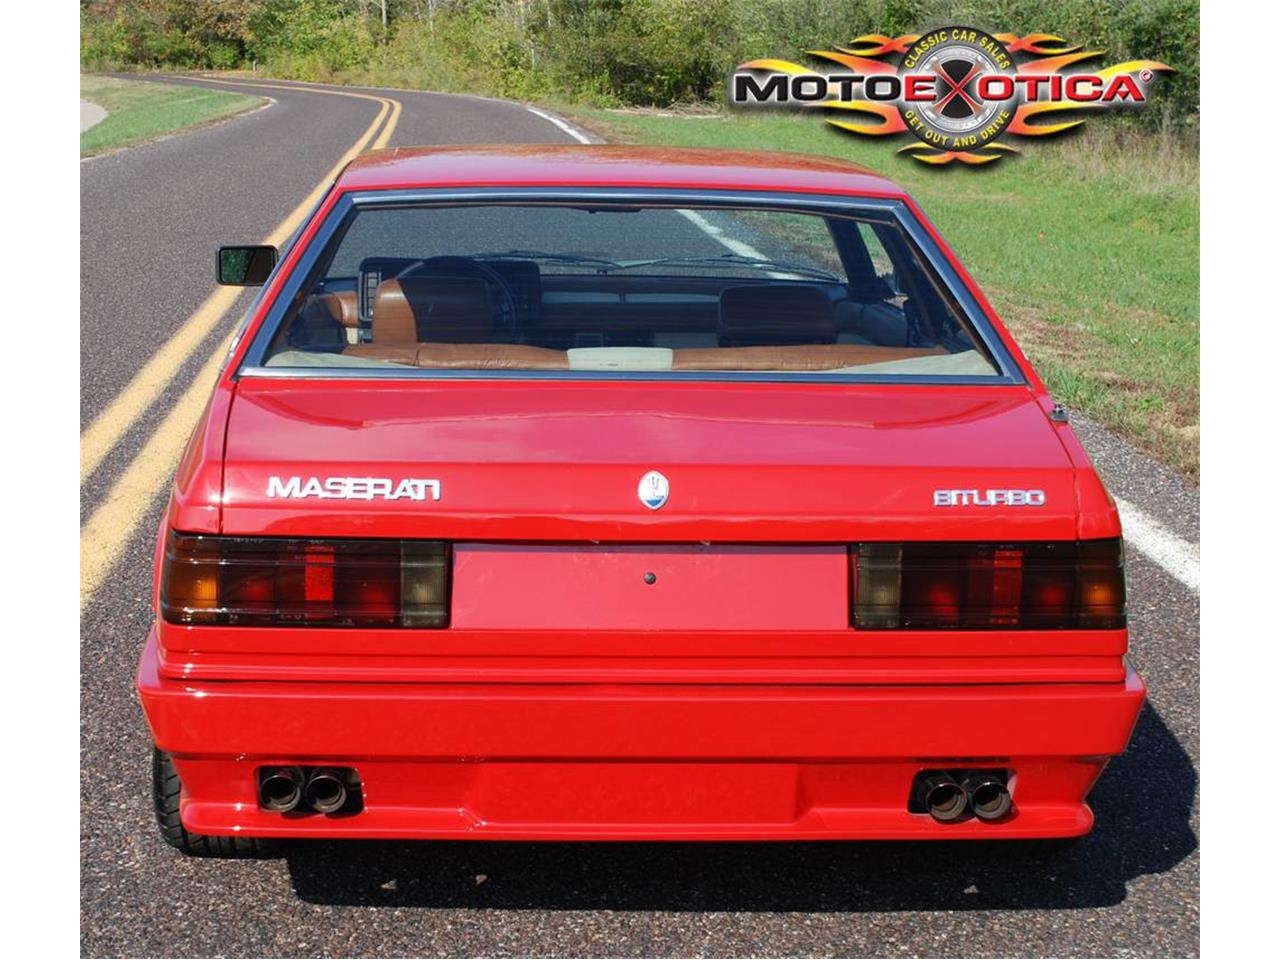 1985 Maserati Biturbo for Sale | ClassicCars.com | CC-553887